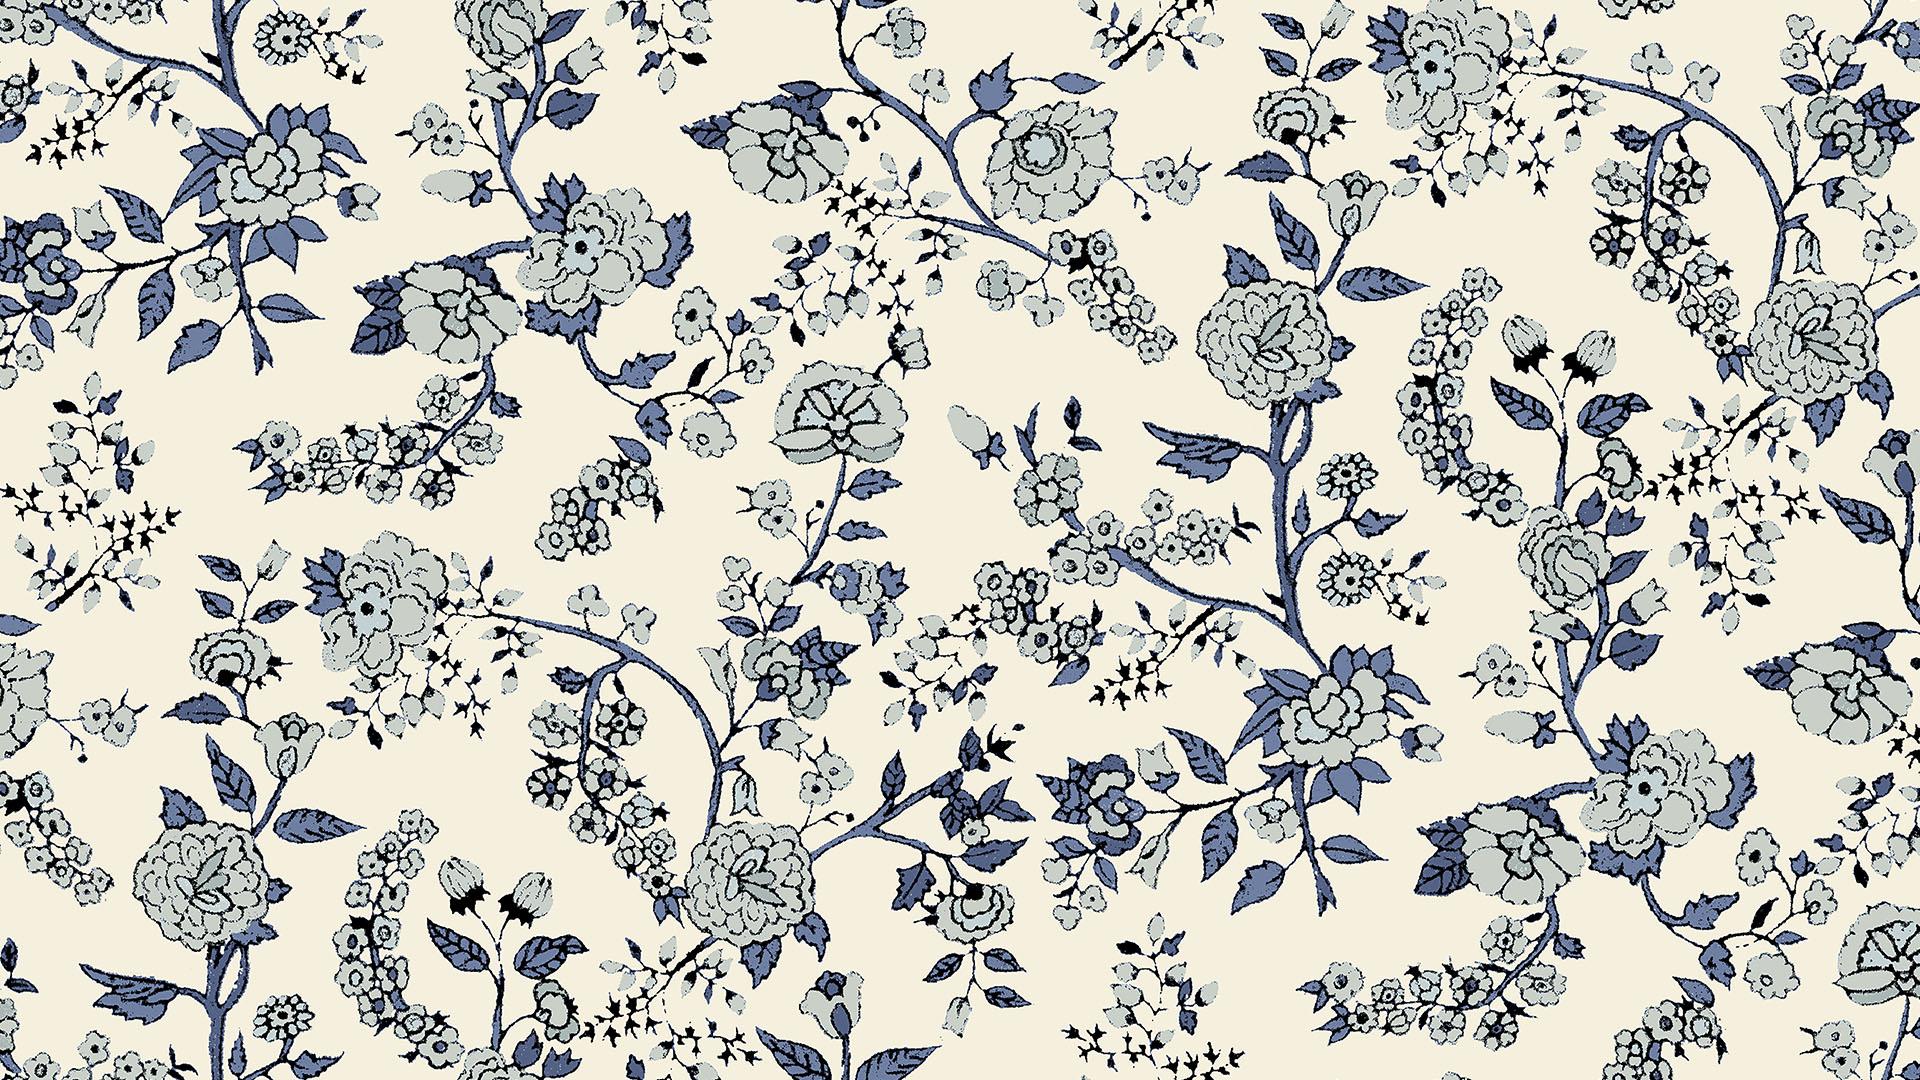 download Gallery For gt Floral Pattern Desktop Wallpaper 1920x1080